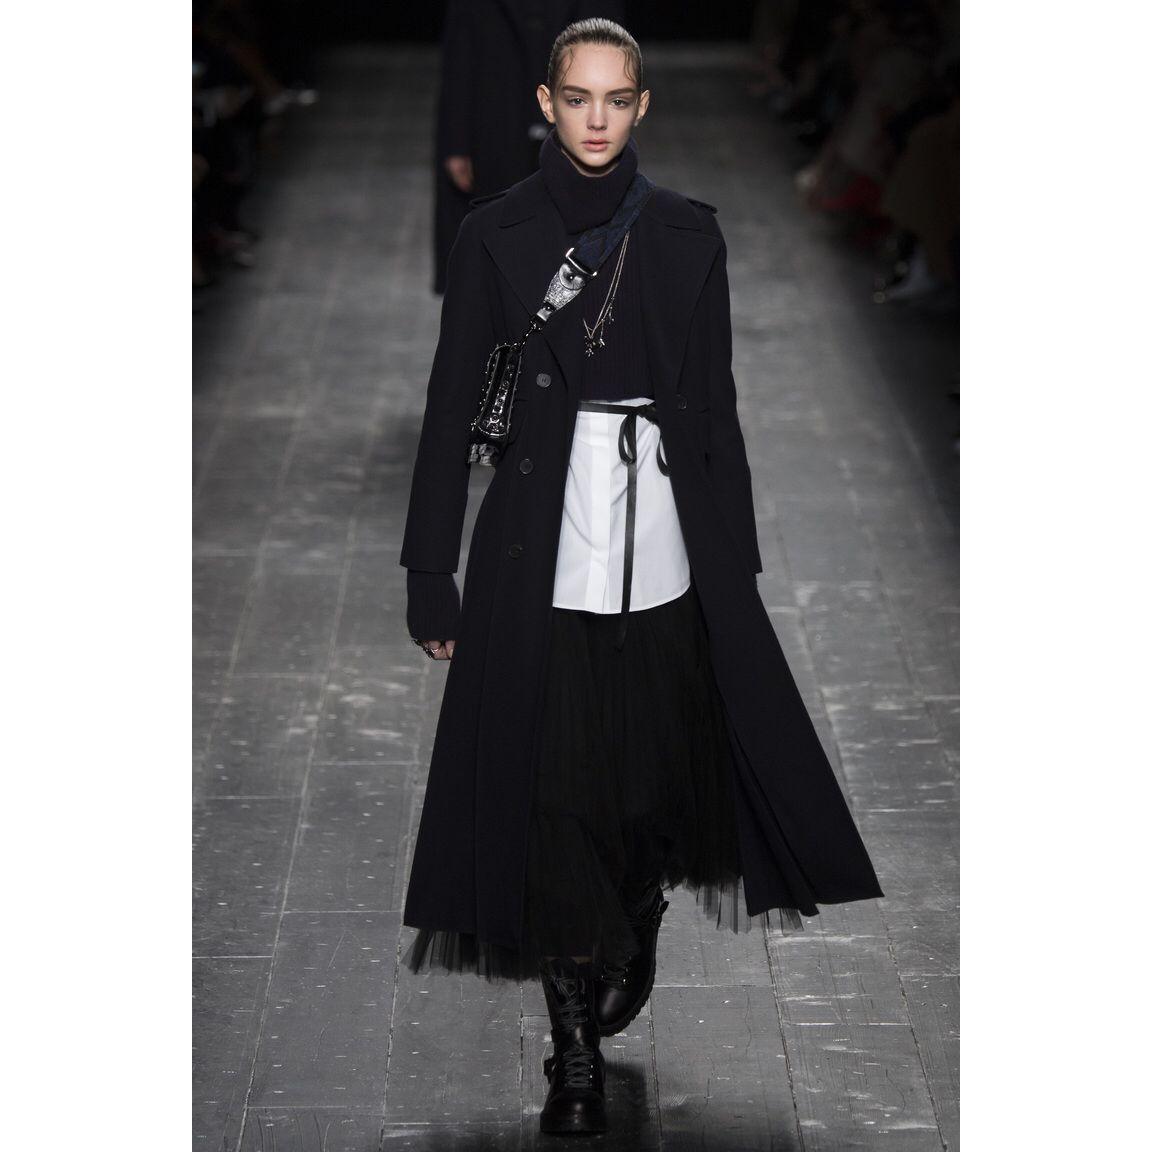 Valentino  #VogueRussia #readytowear #rtw #fallwinter2016 #Valentino #VogueCollections